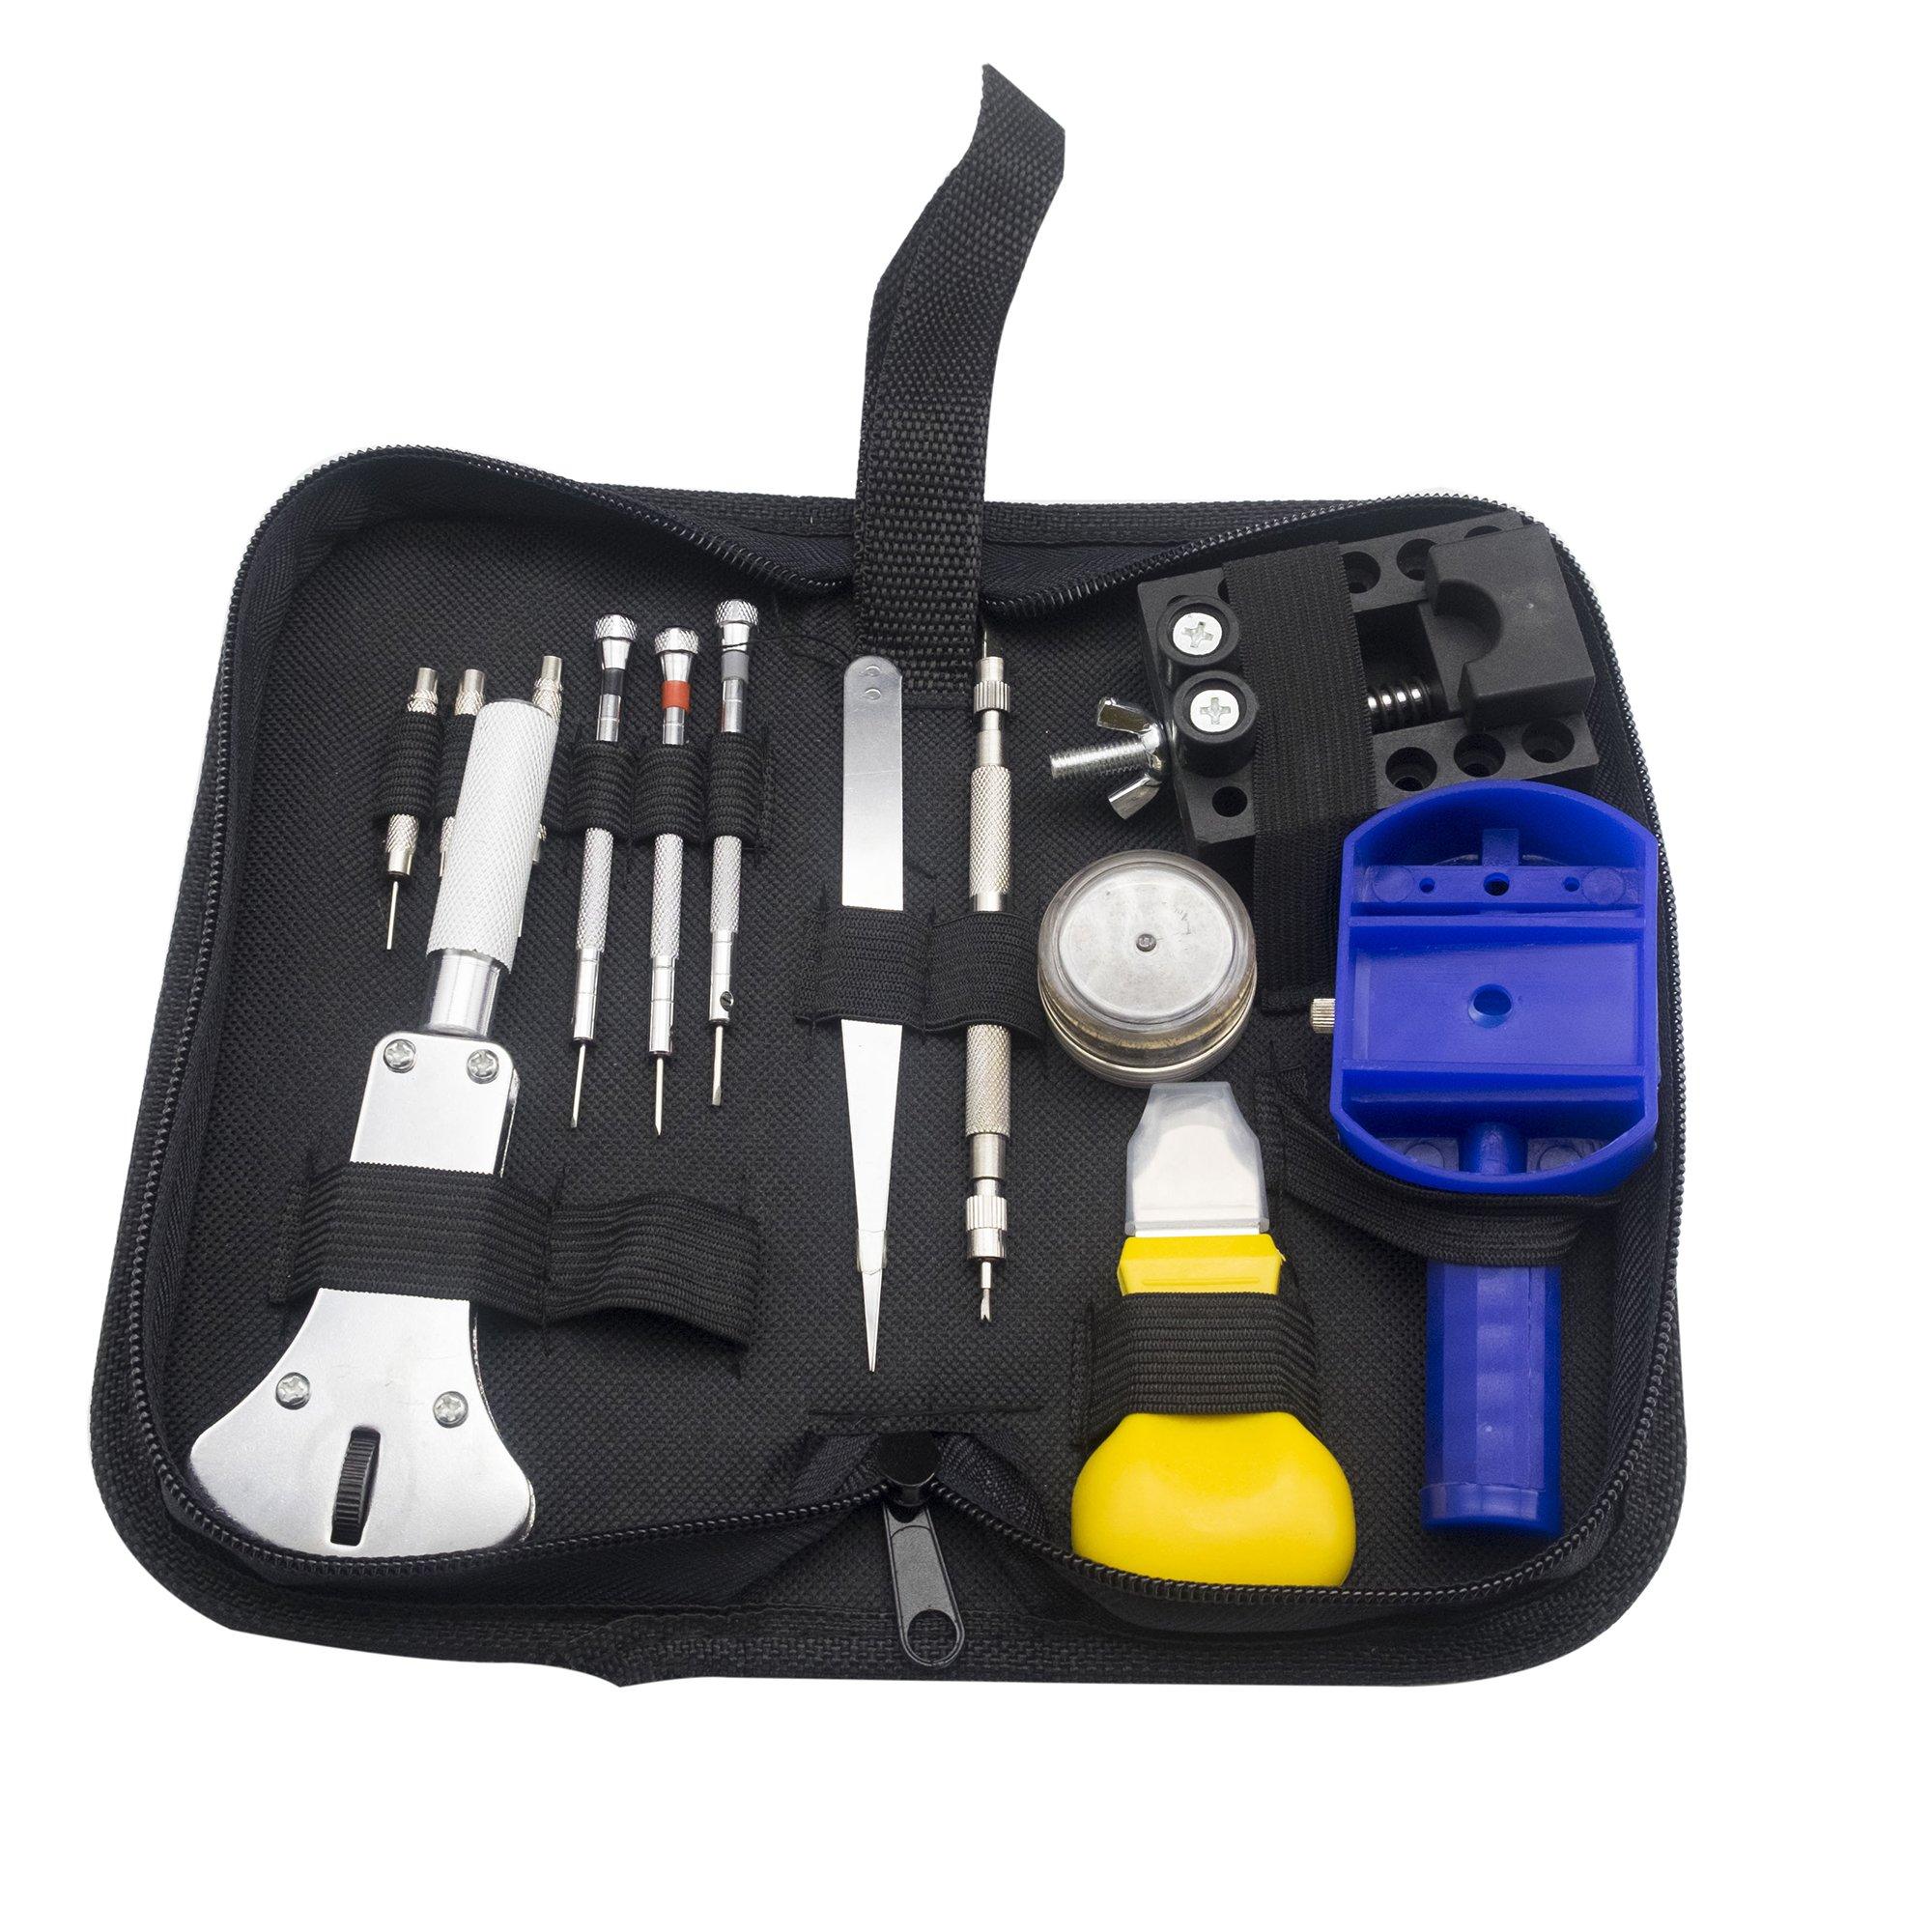 YAOGONG Portable 283 PCS Professional Watch Repair Kit, Light Watch Tool Set